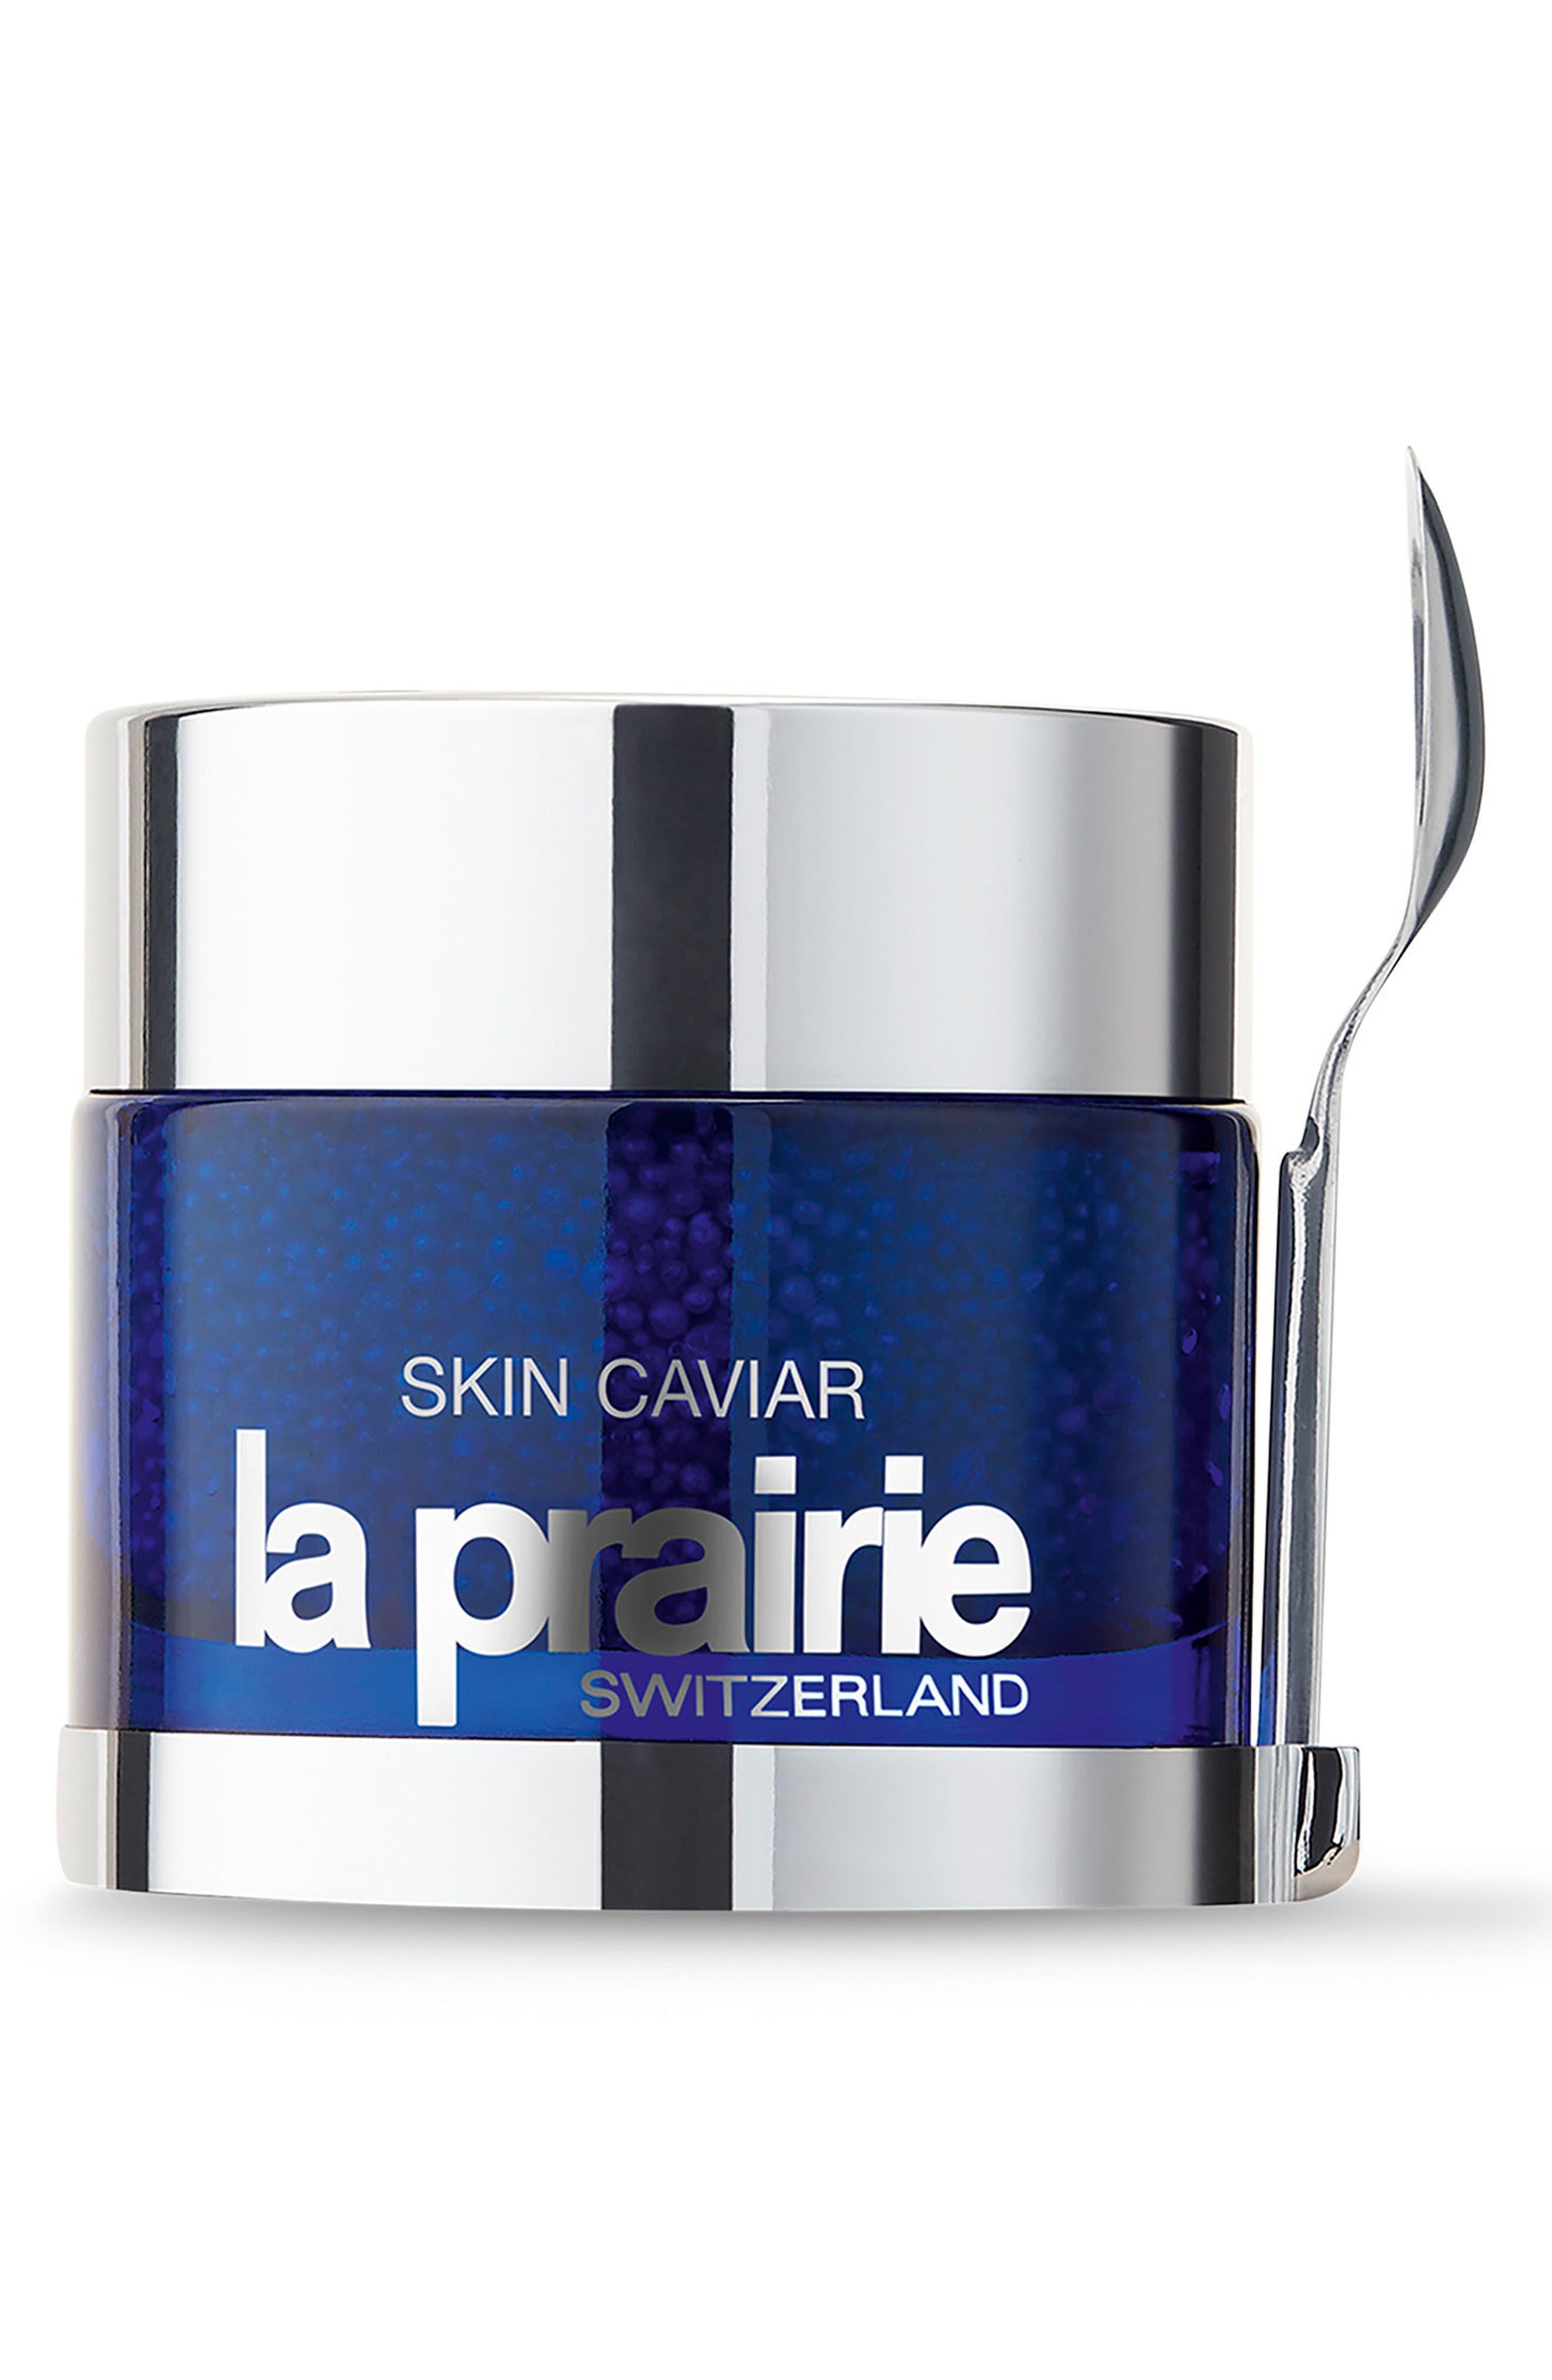 La Prairie Beauty SKIN CAVIAR